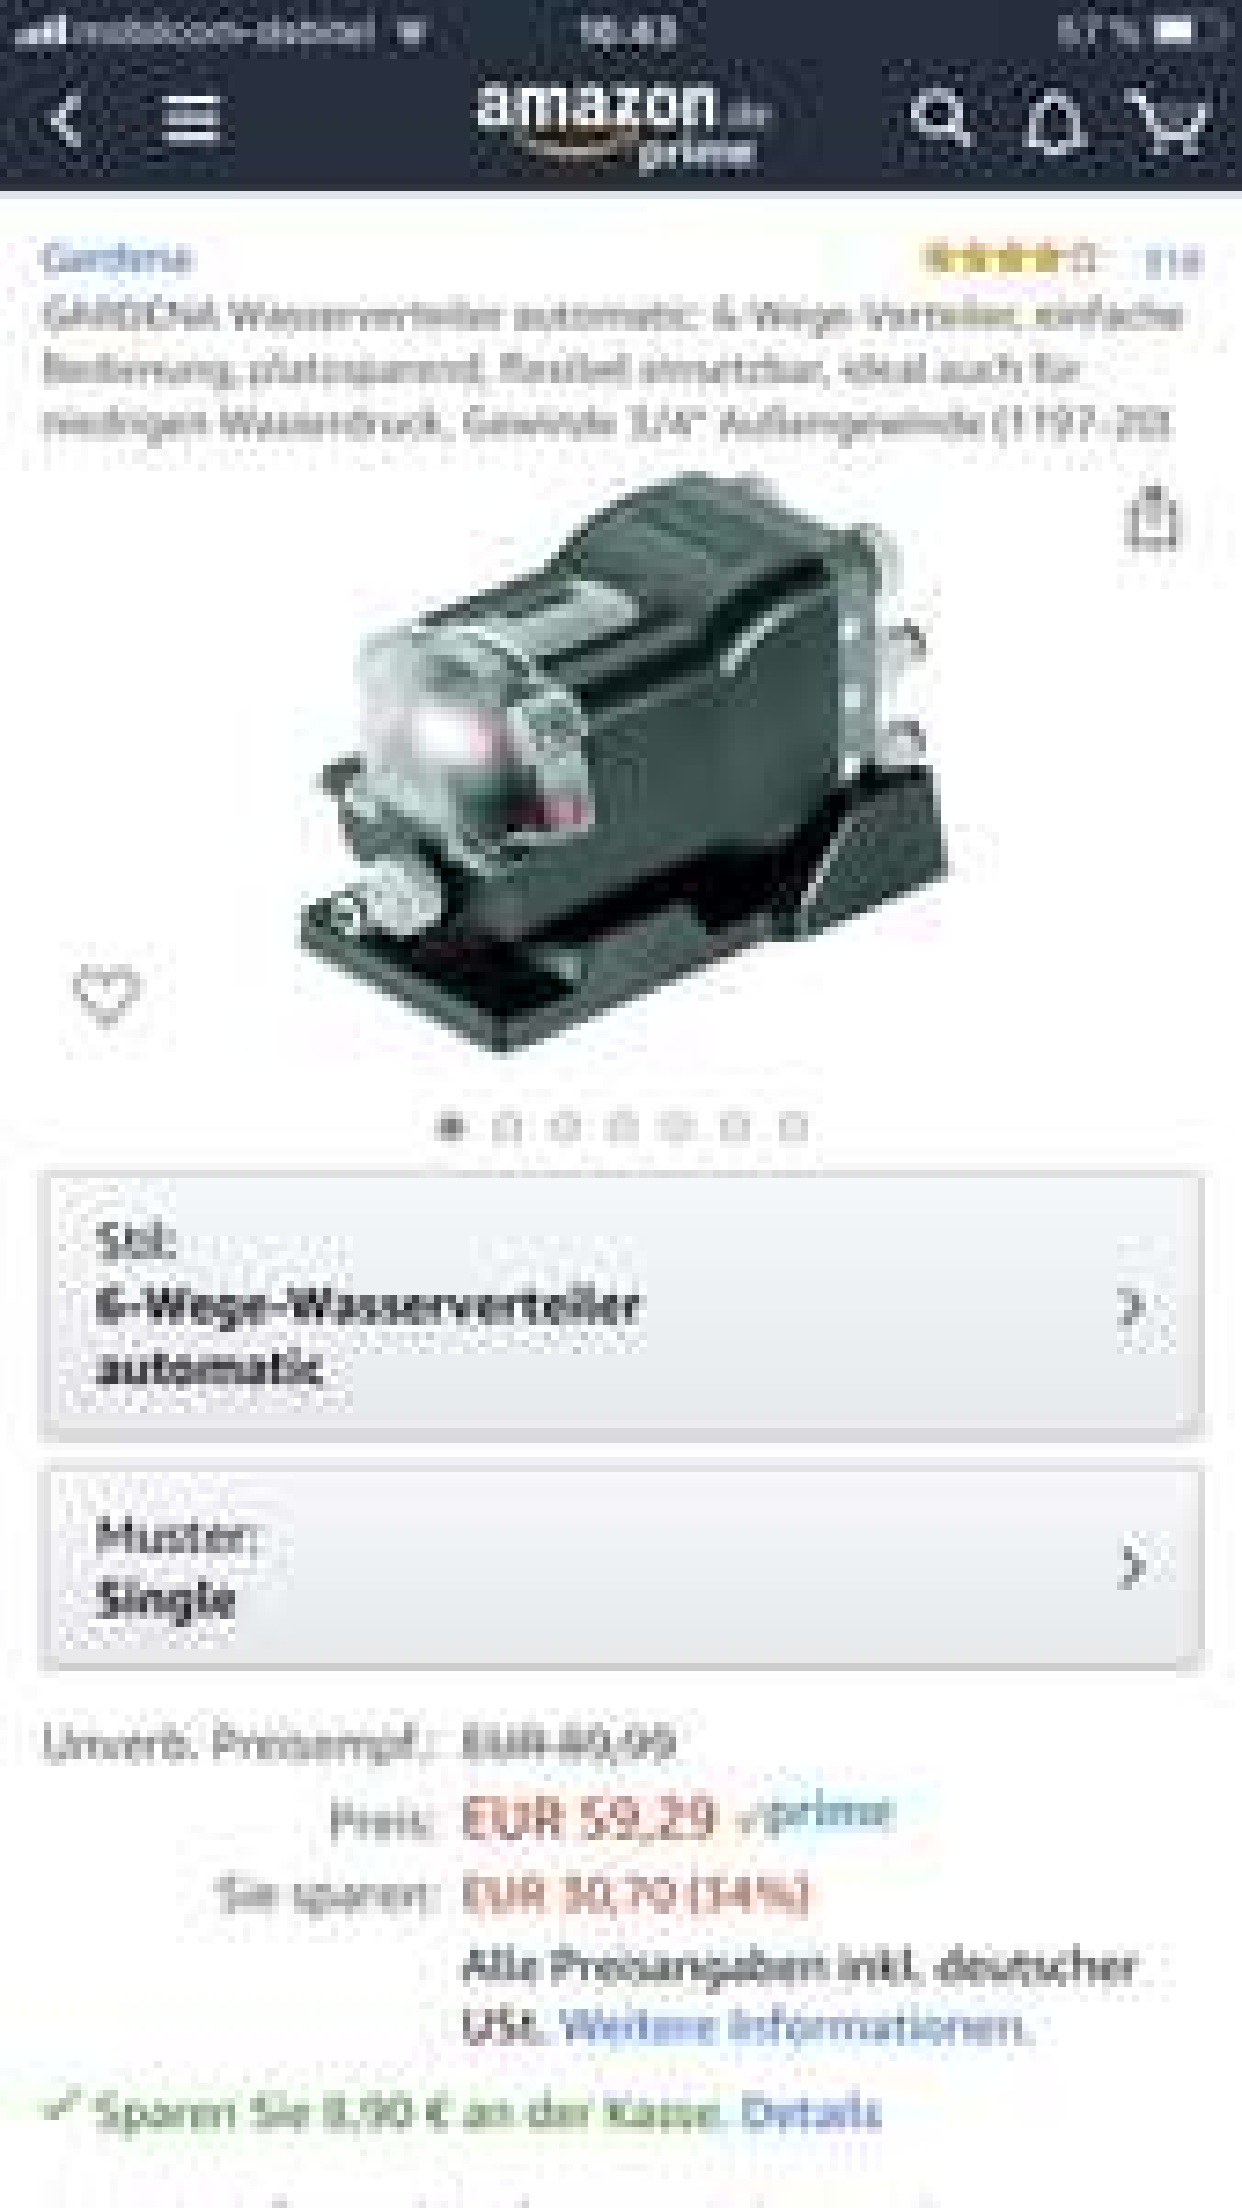 Gardena Automatik Wasserverteiler 1197-20 Amazon Prime